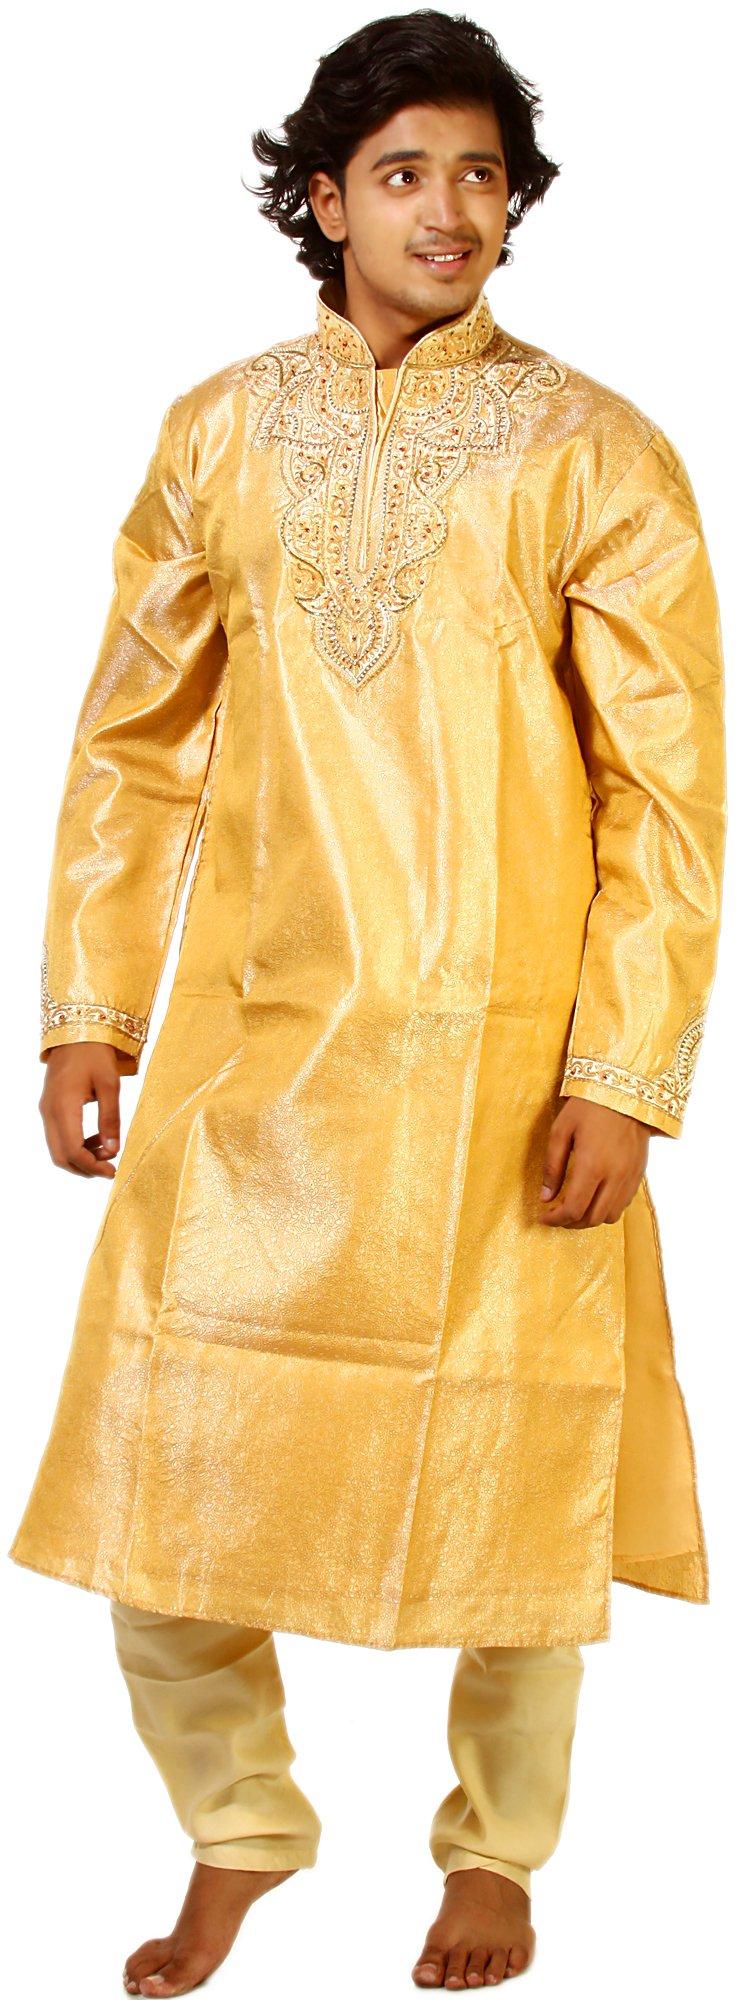 Exotic India Golden-Apricot Wedding Kurta - Multi Color Size 42 by Exotic India